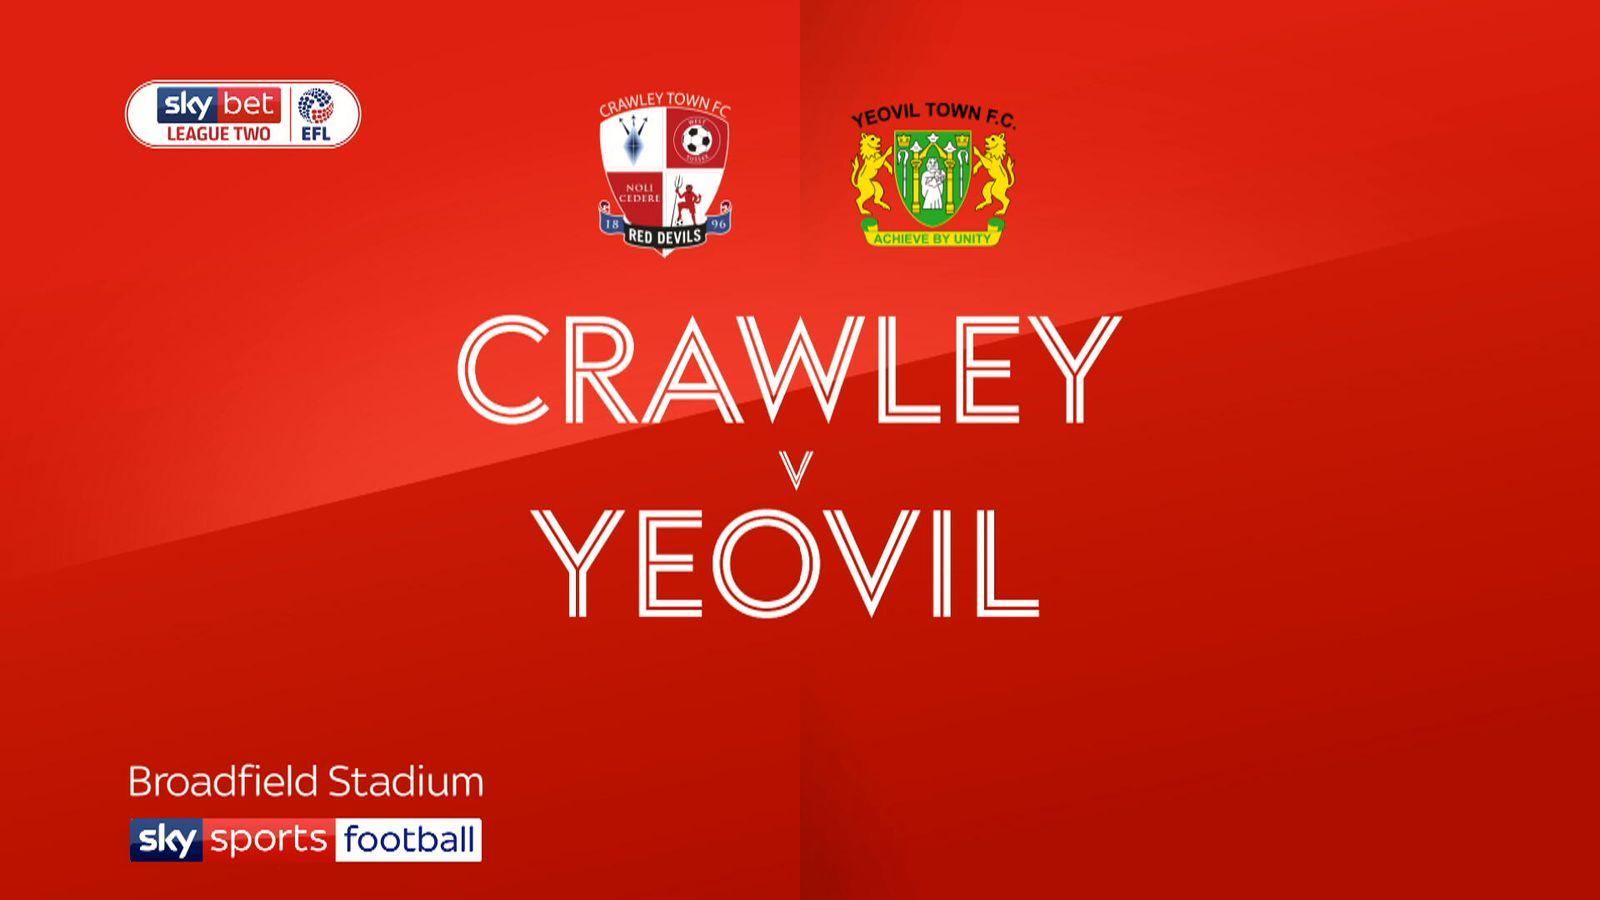 1477f28a4cb Crawley 3 - 1 Yeovil - Match Report & Highlights